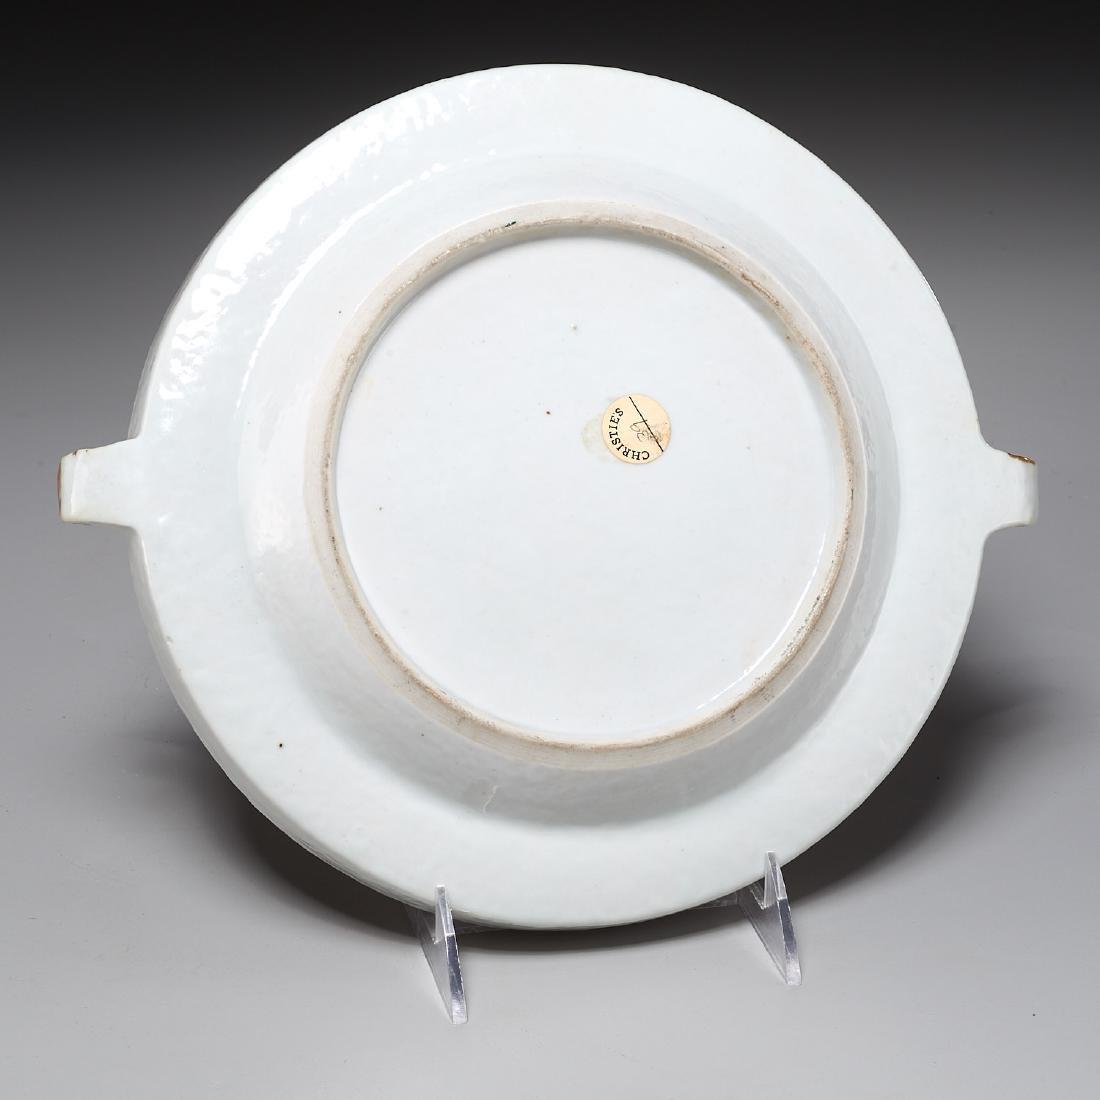 Chinese Export Rockefeller pattern warming plate - 7